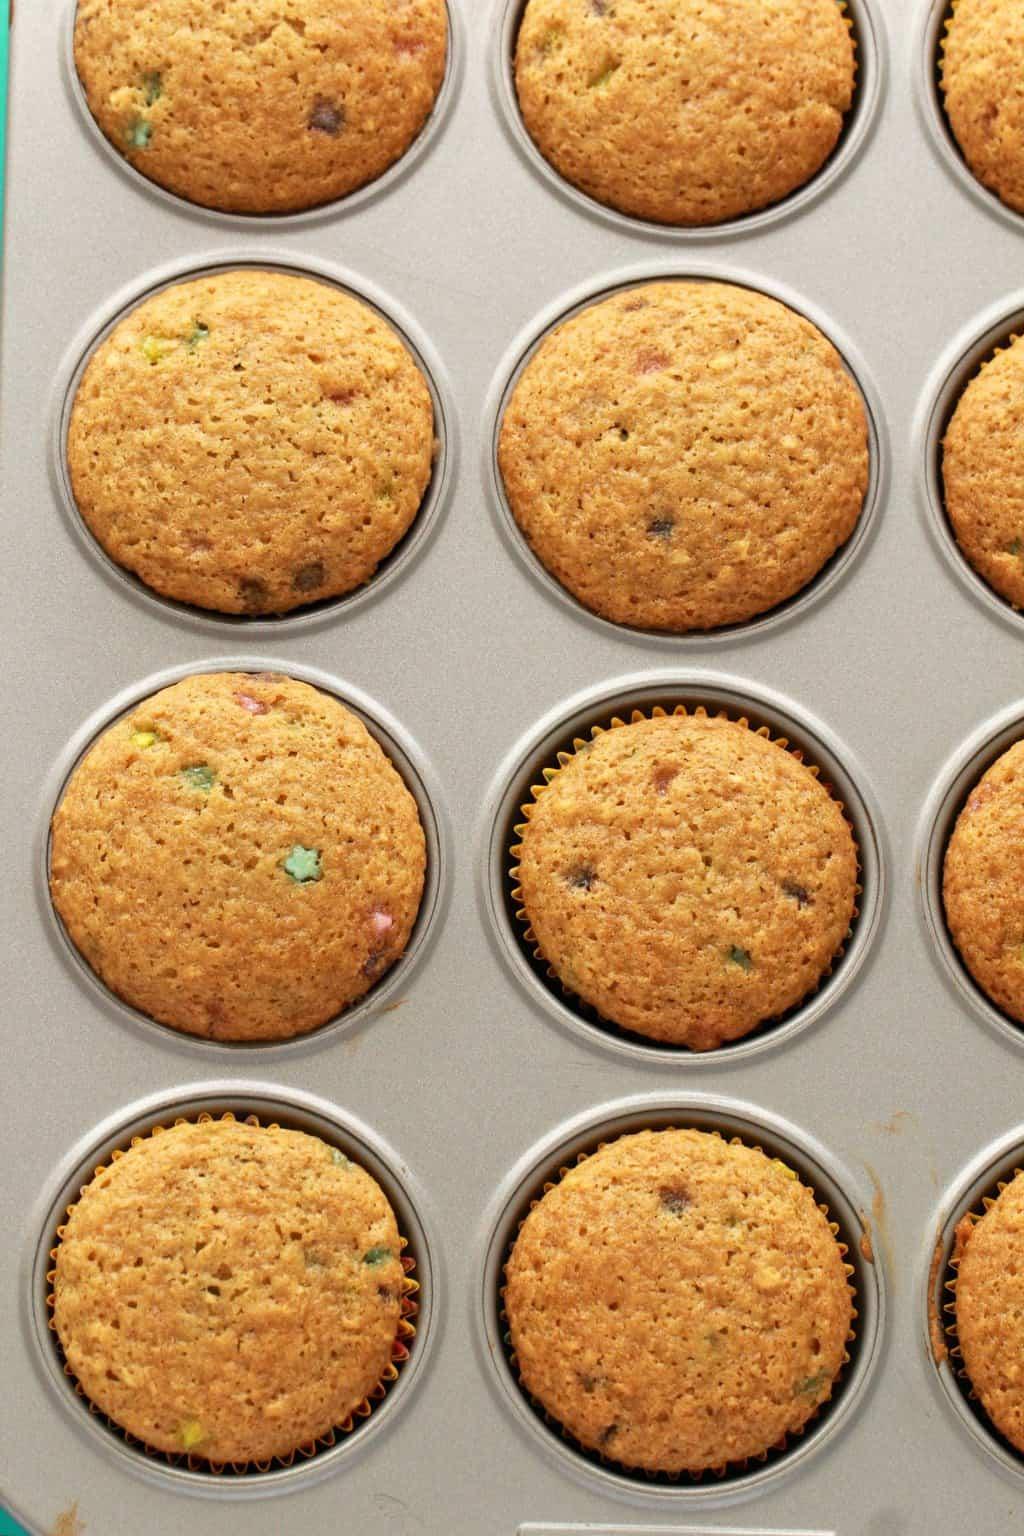 Making Vegan Funfetti Cupcakes. #vegan #lovingitvegan #cupcakes #dessert